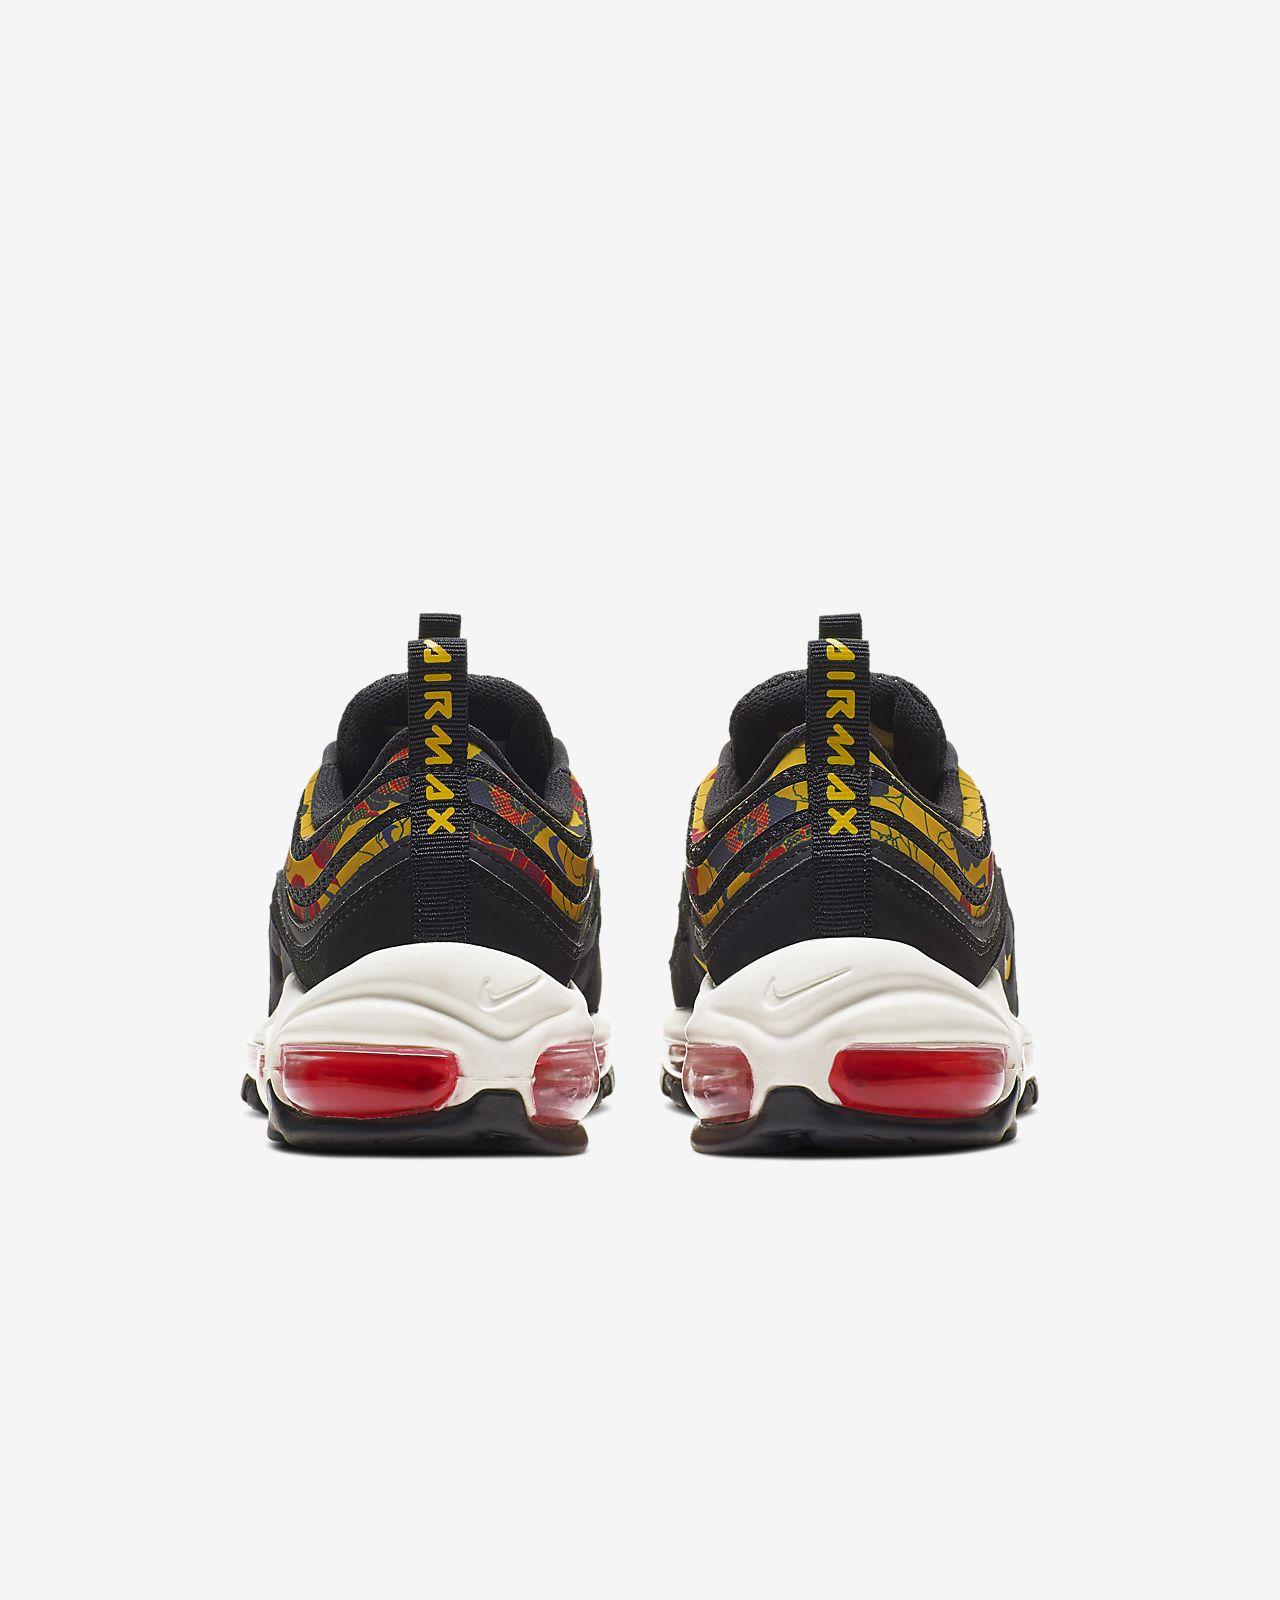 Chaussure Nike Air Max 97 SE Floral pour Femme